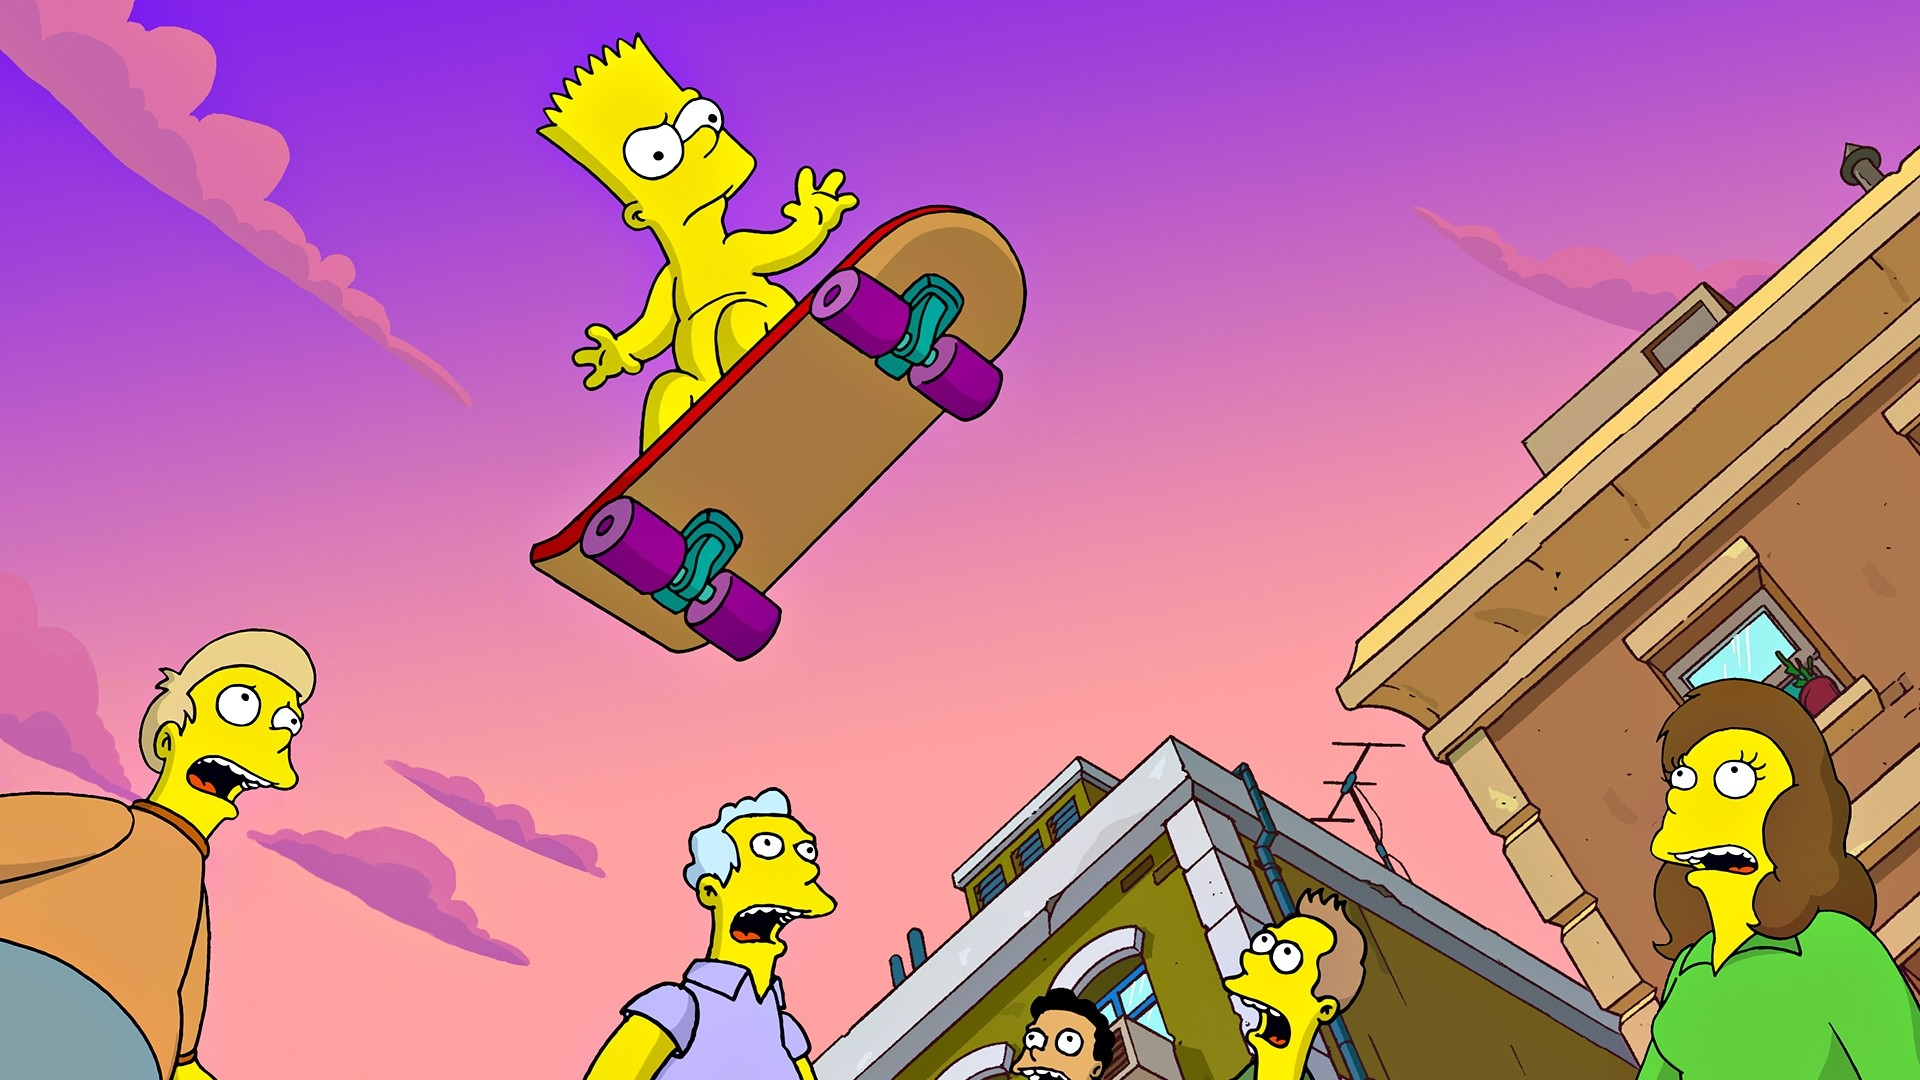 Bart Simpson Skating Wallpaper, A Wallpaper Of Bart - Bart Simpson On Skateboard - HD Wallpaper